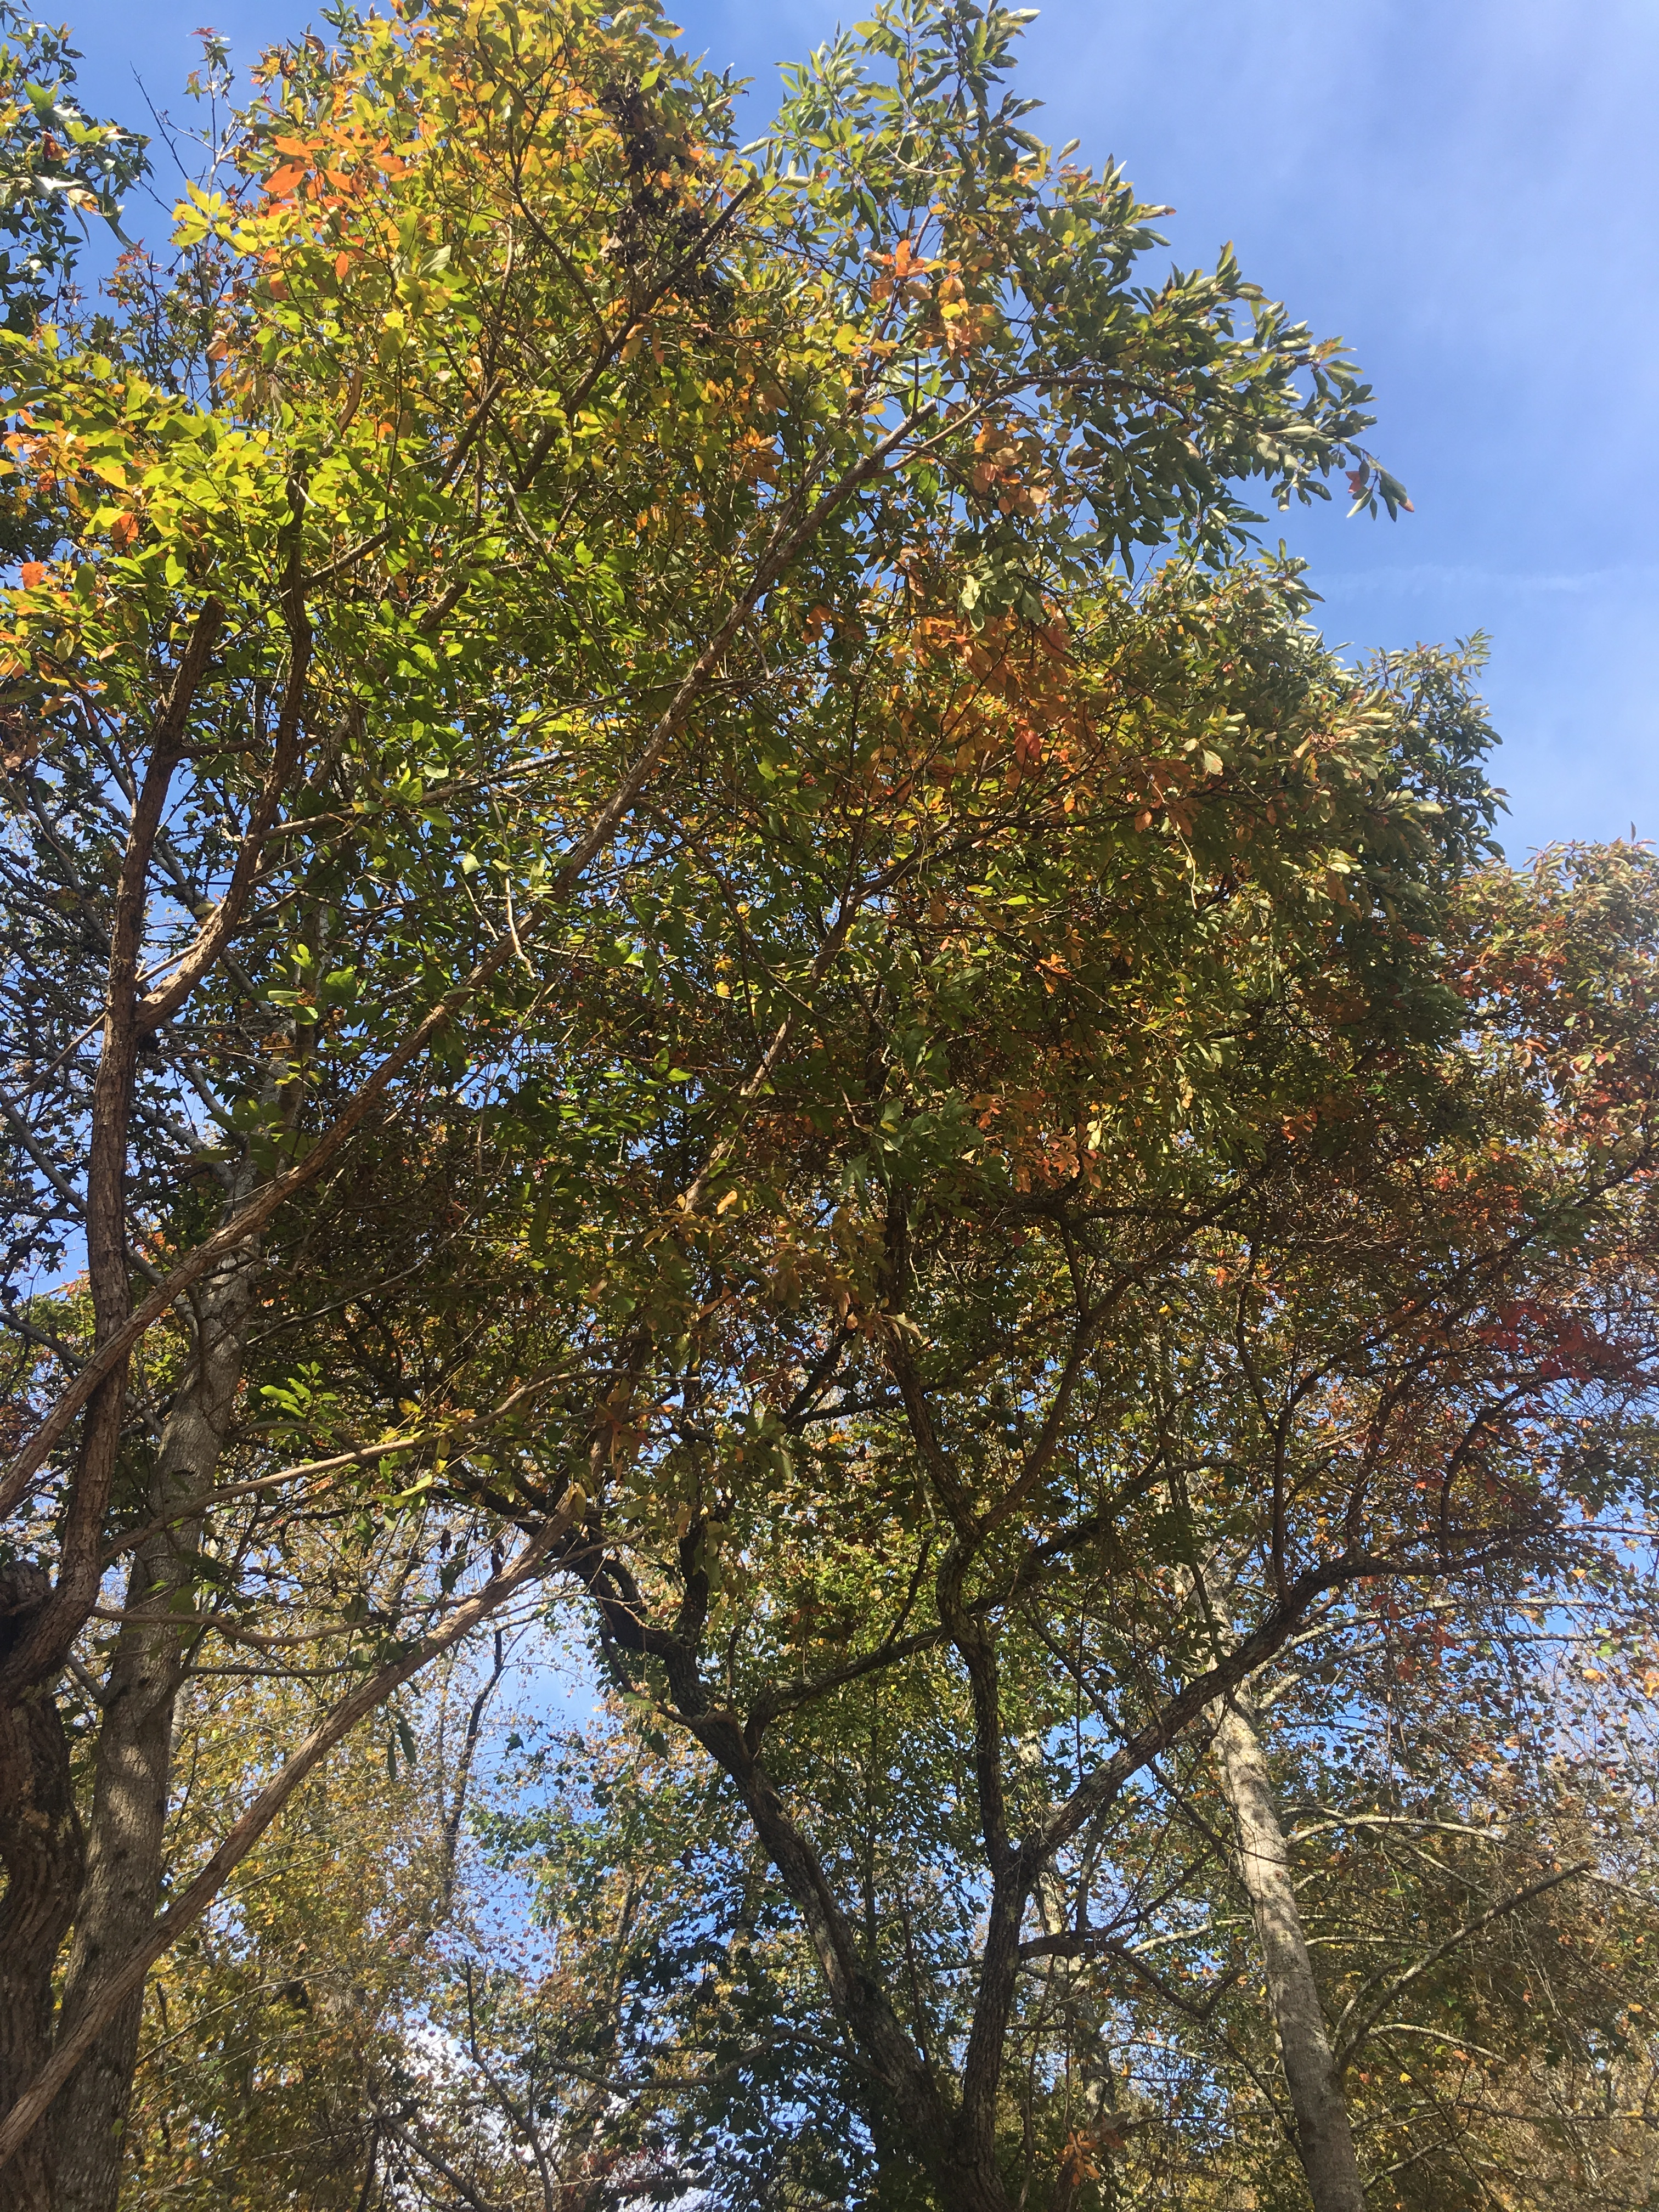 A mature Sassafras tree at the beginning of Fall